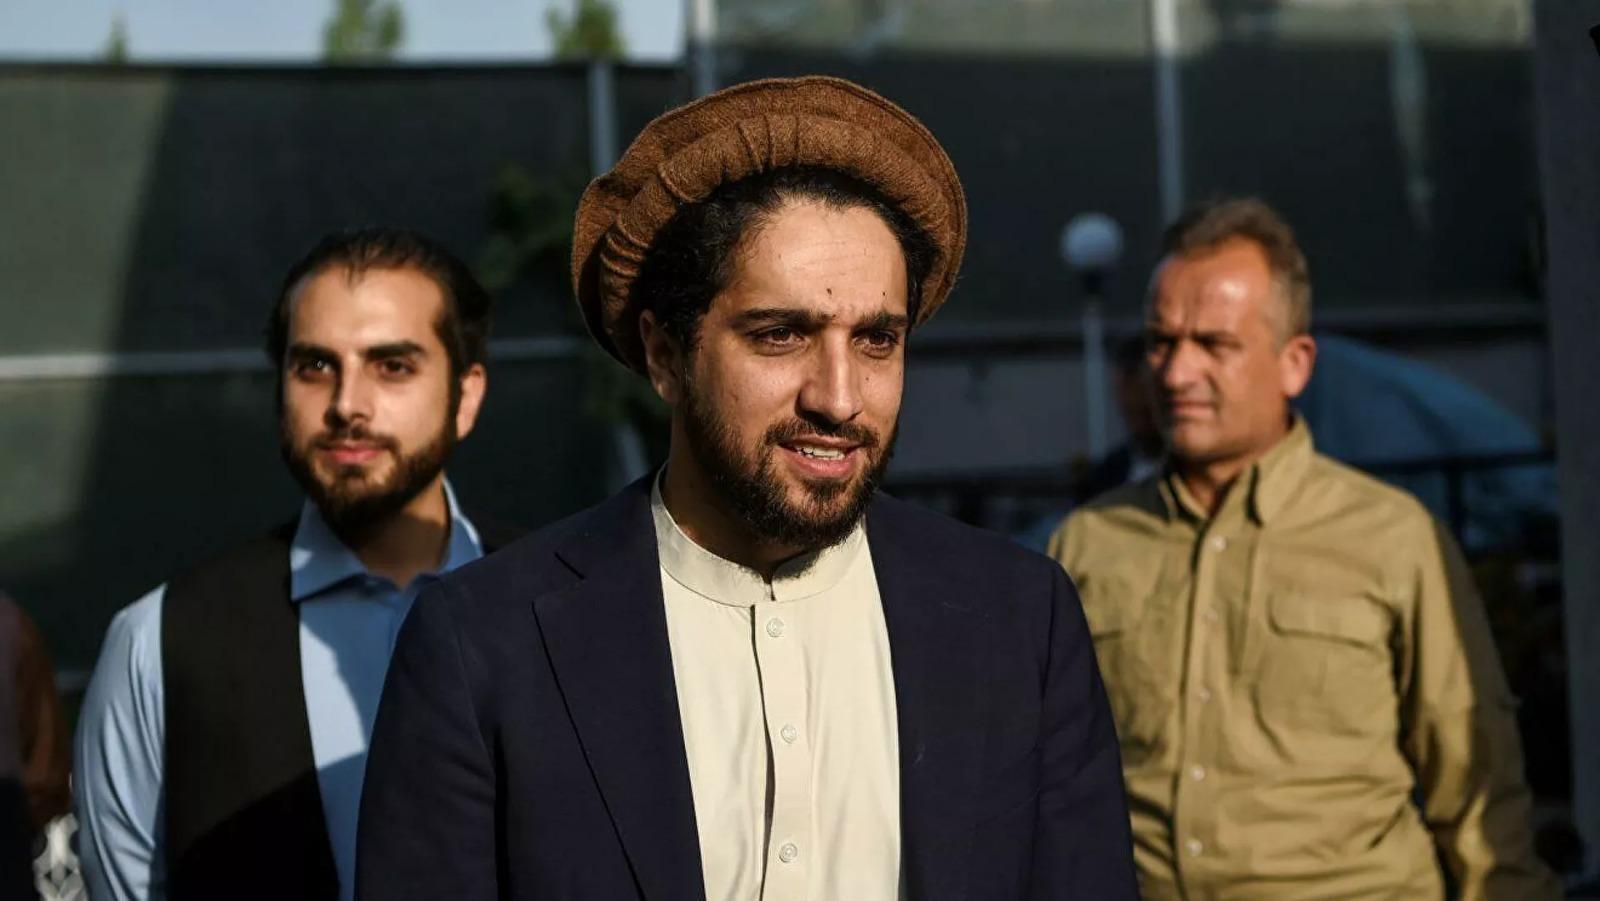 Ahmed Mesud: Taliban'a karşı direnişe son vermeyeceğiz